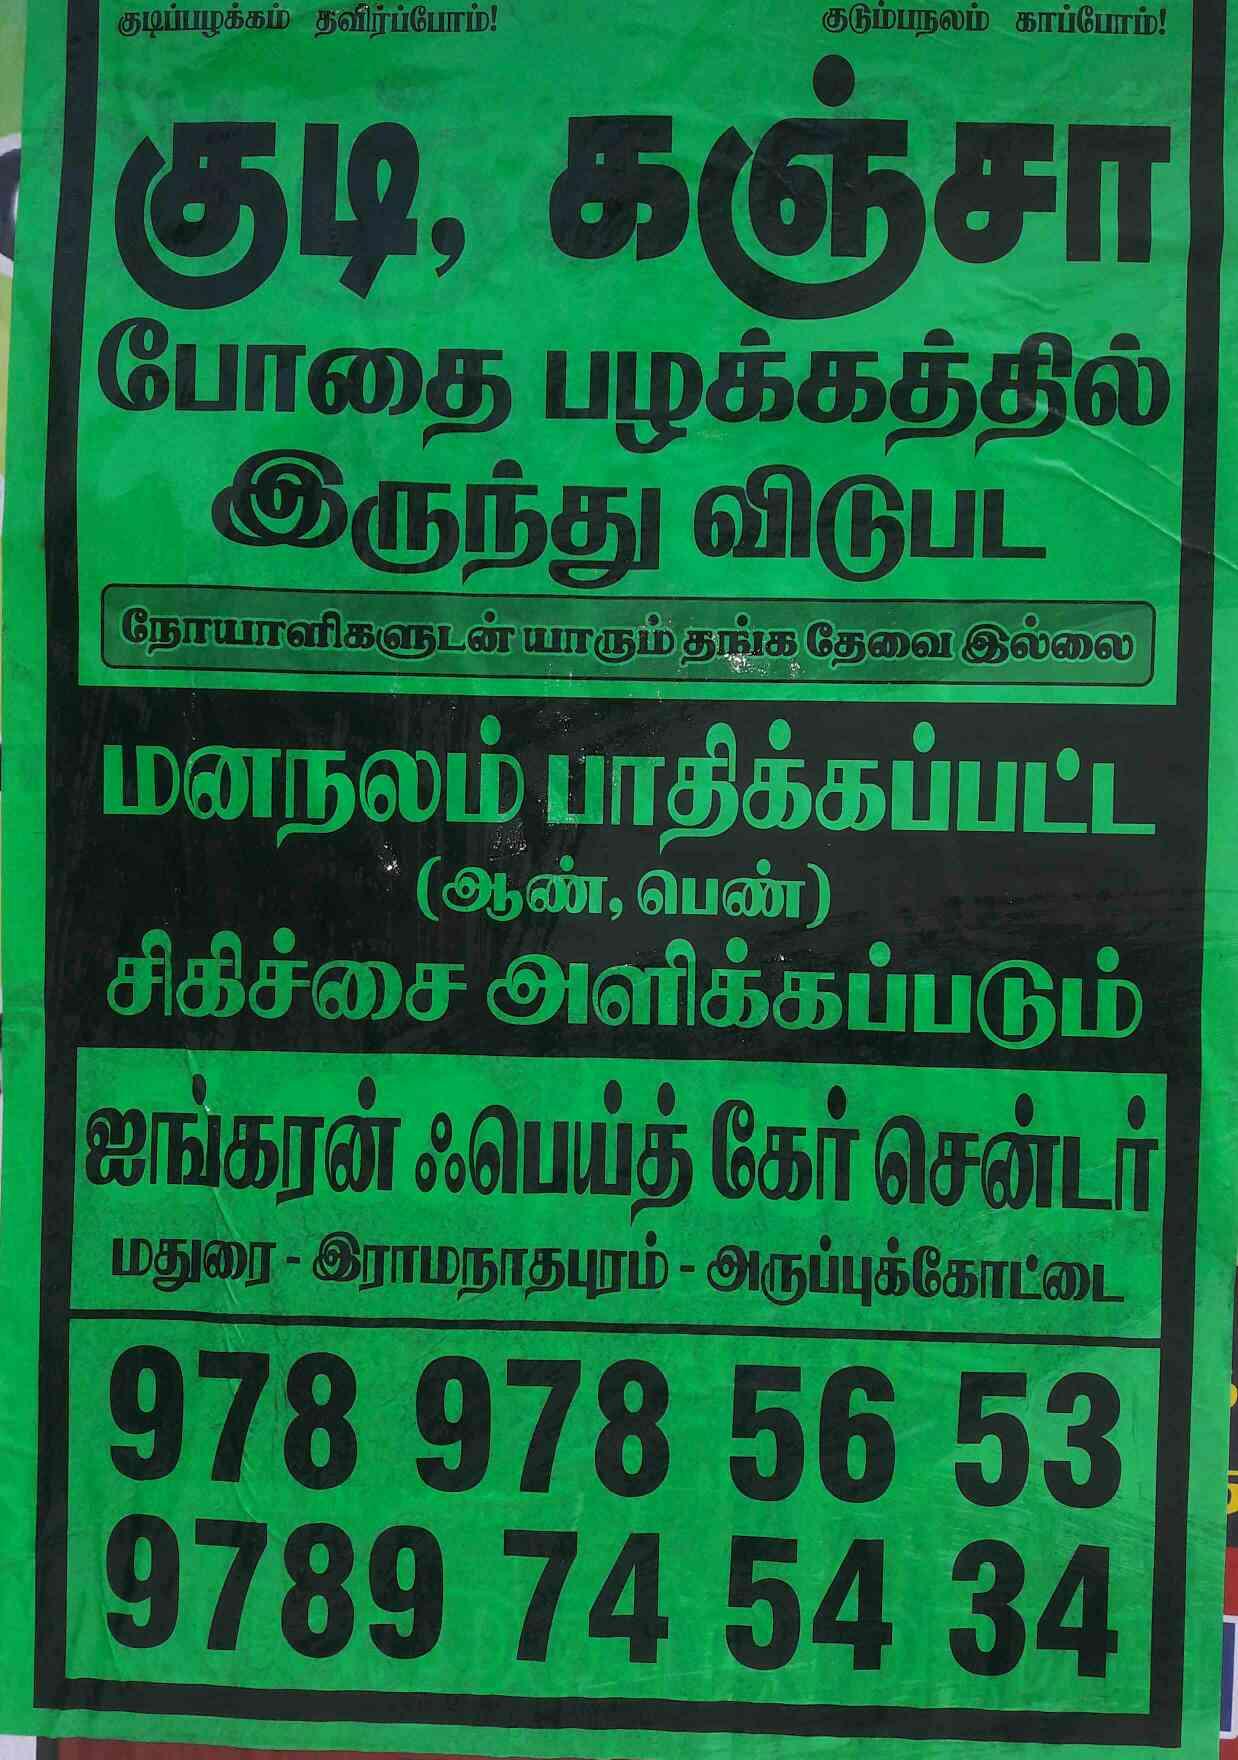 Best Deaddiction Center In Tamilnadu